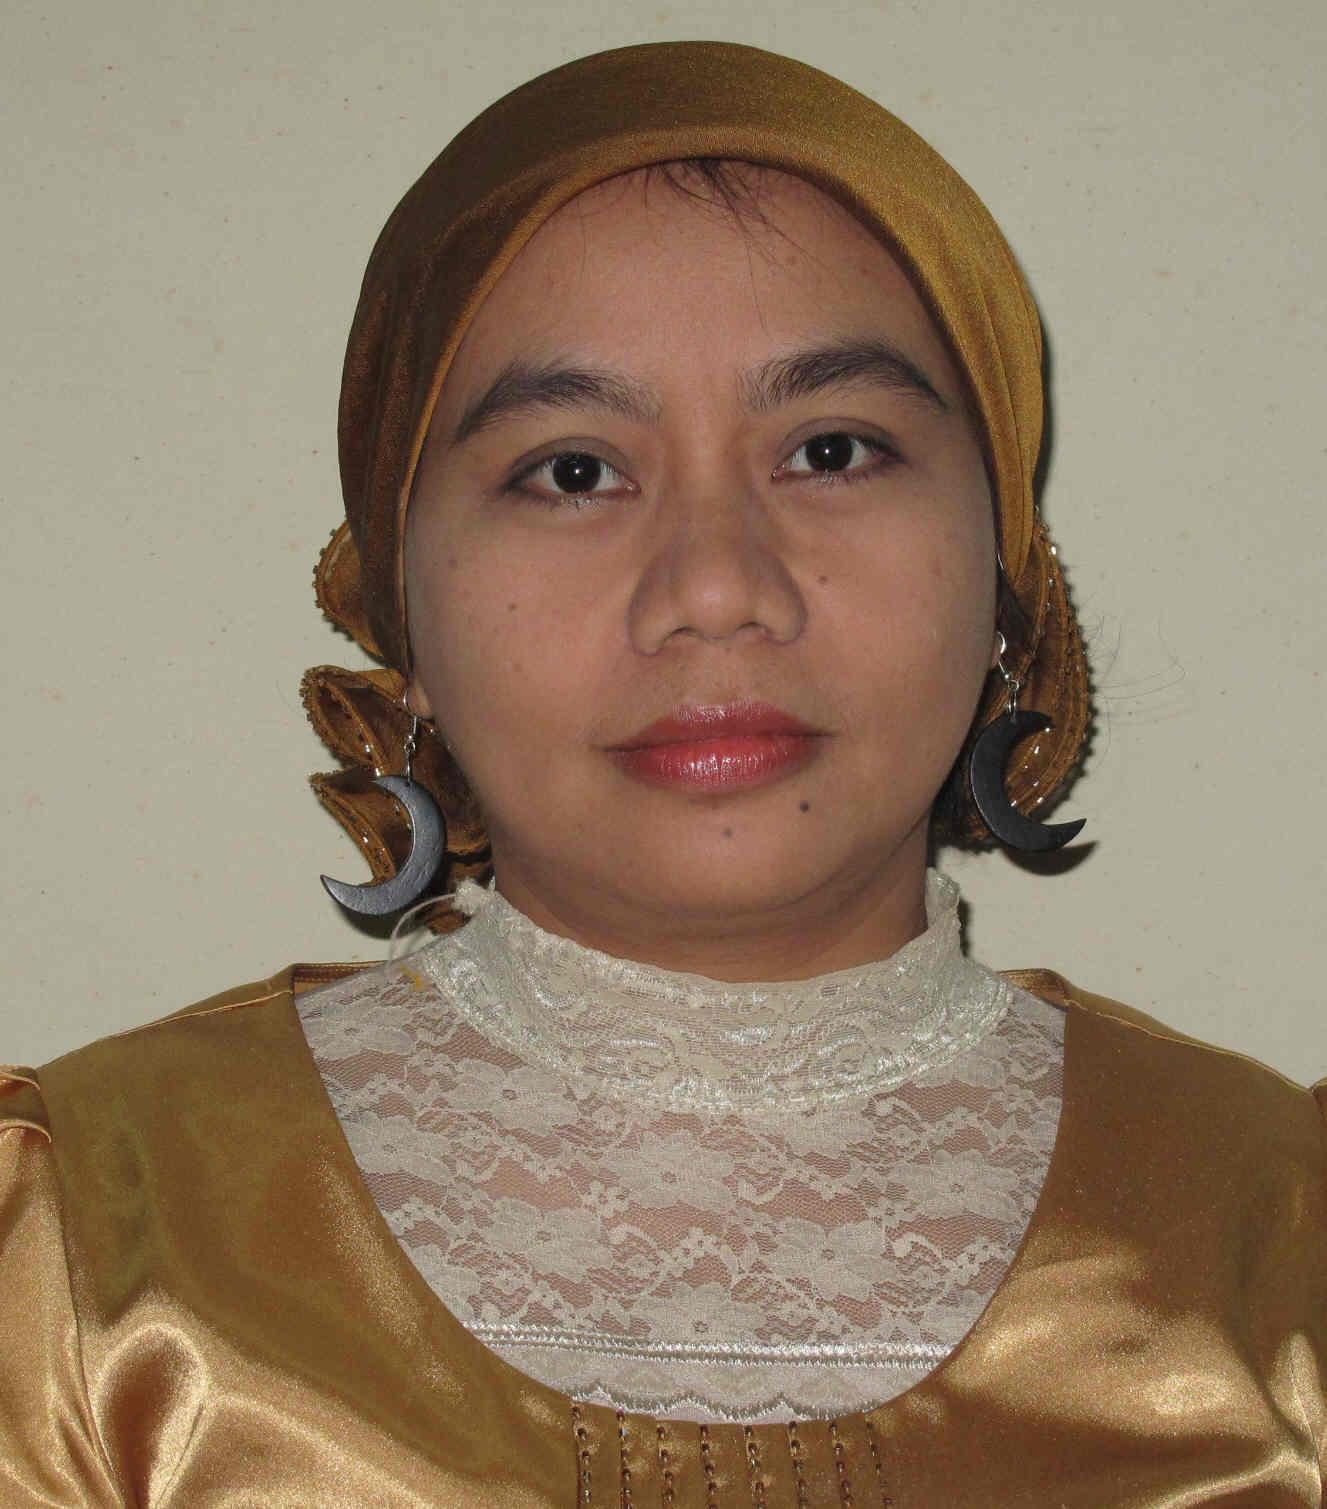 Dr. Enggal Sriwardiningsih, S.E., M.Si.